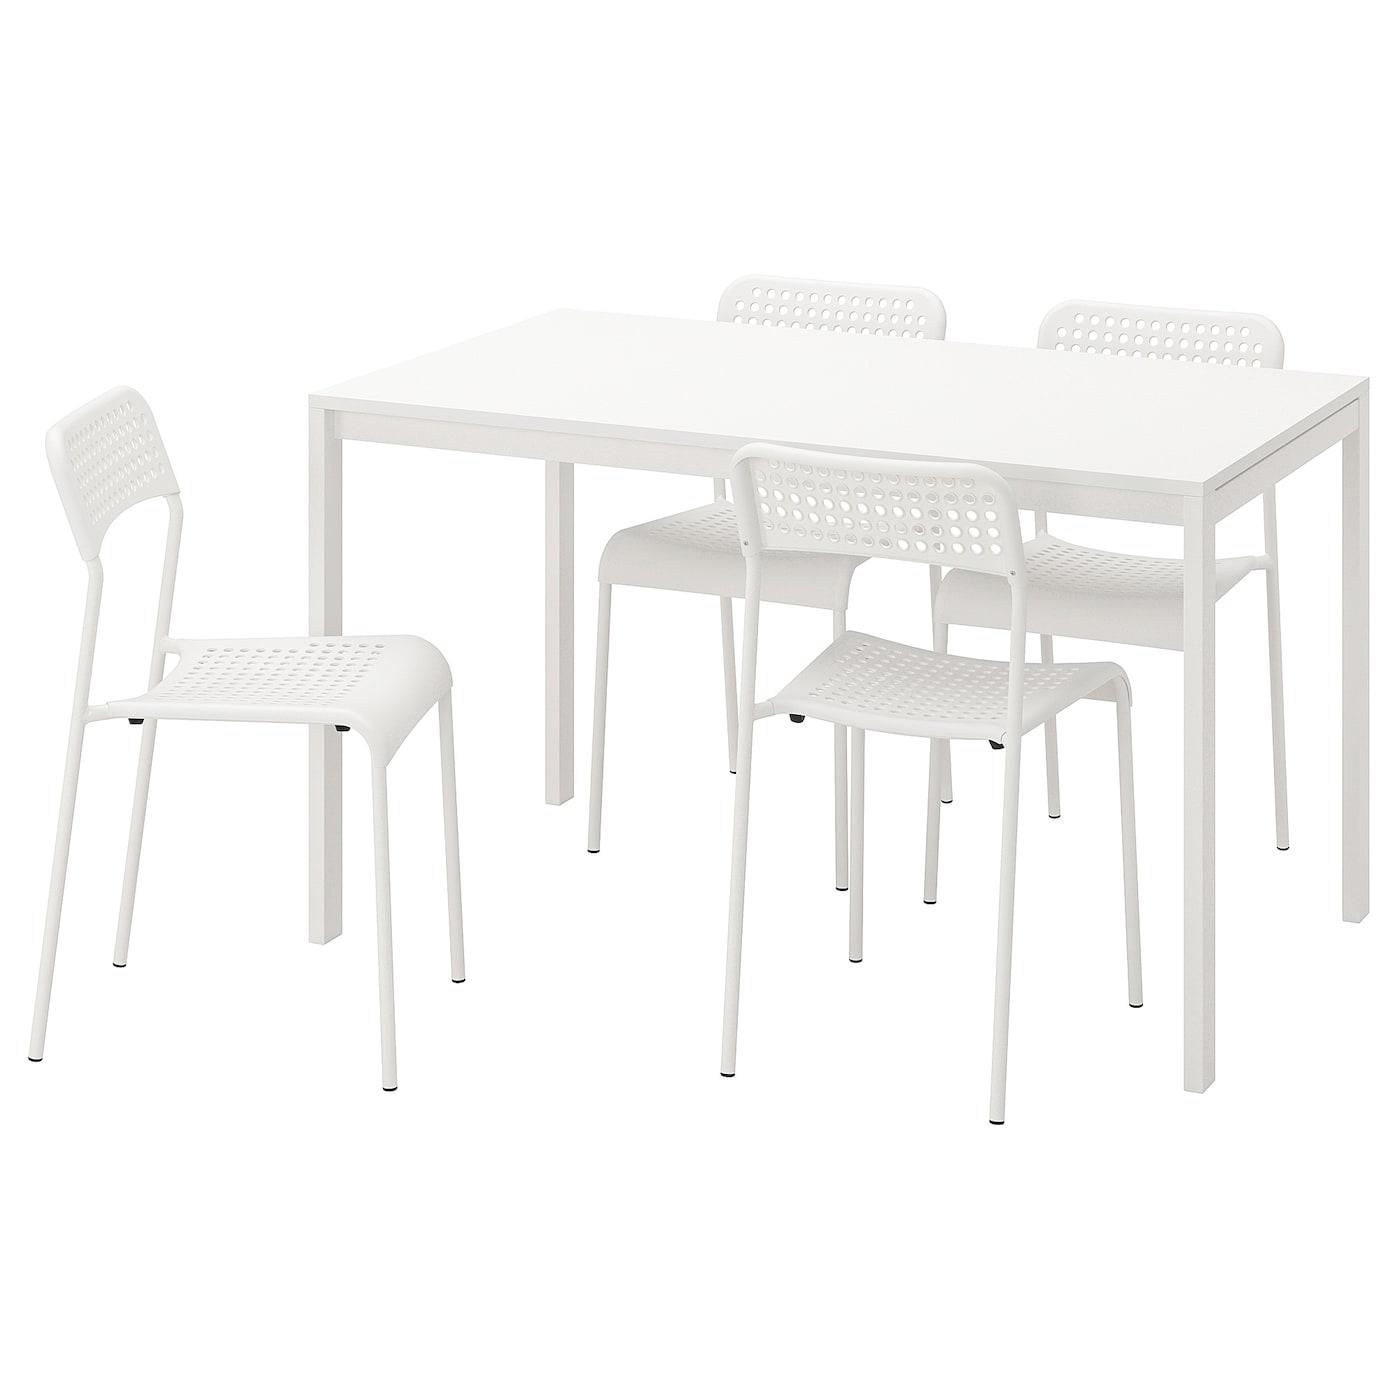 Eettafel En Stoelen Ikea.Melltorp Adde Tafel En 4 Stoelen Wit